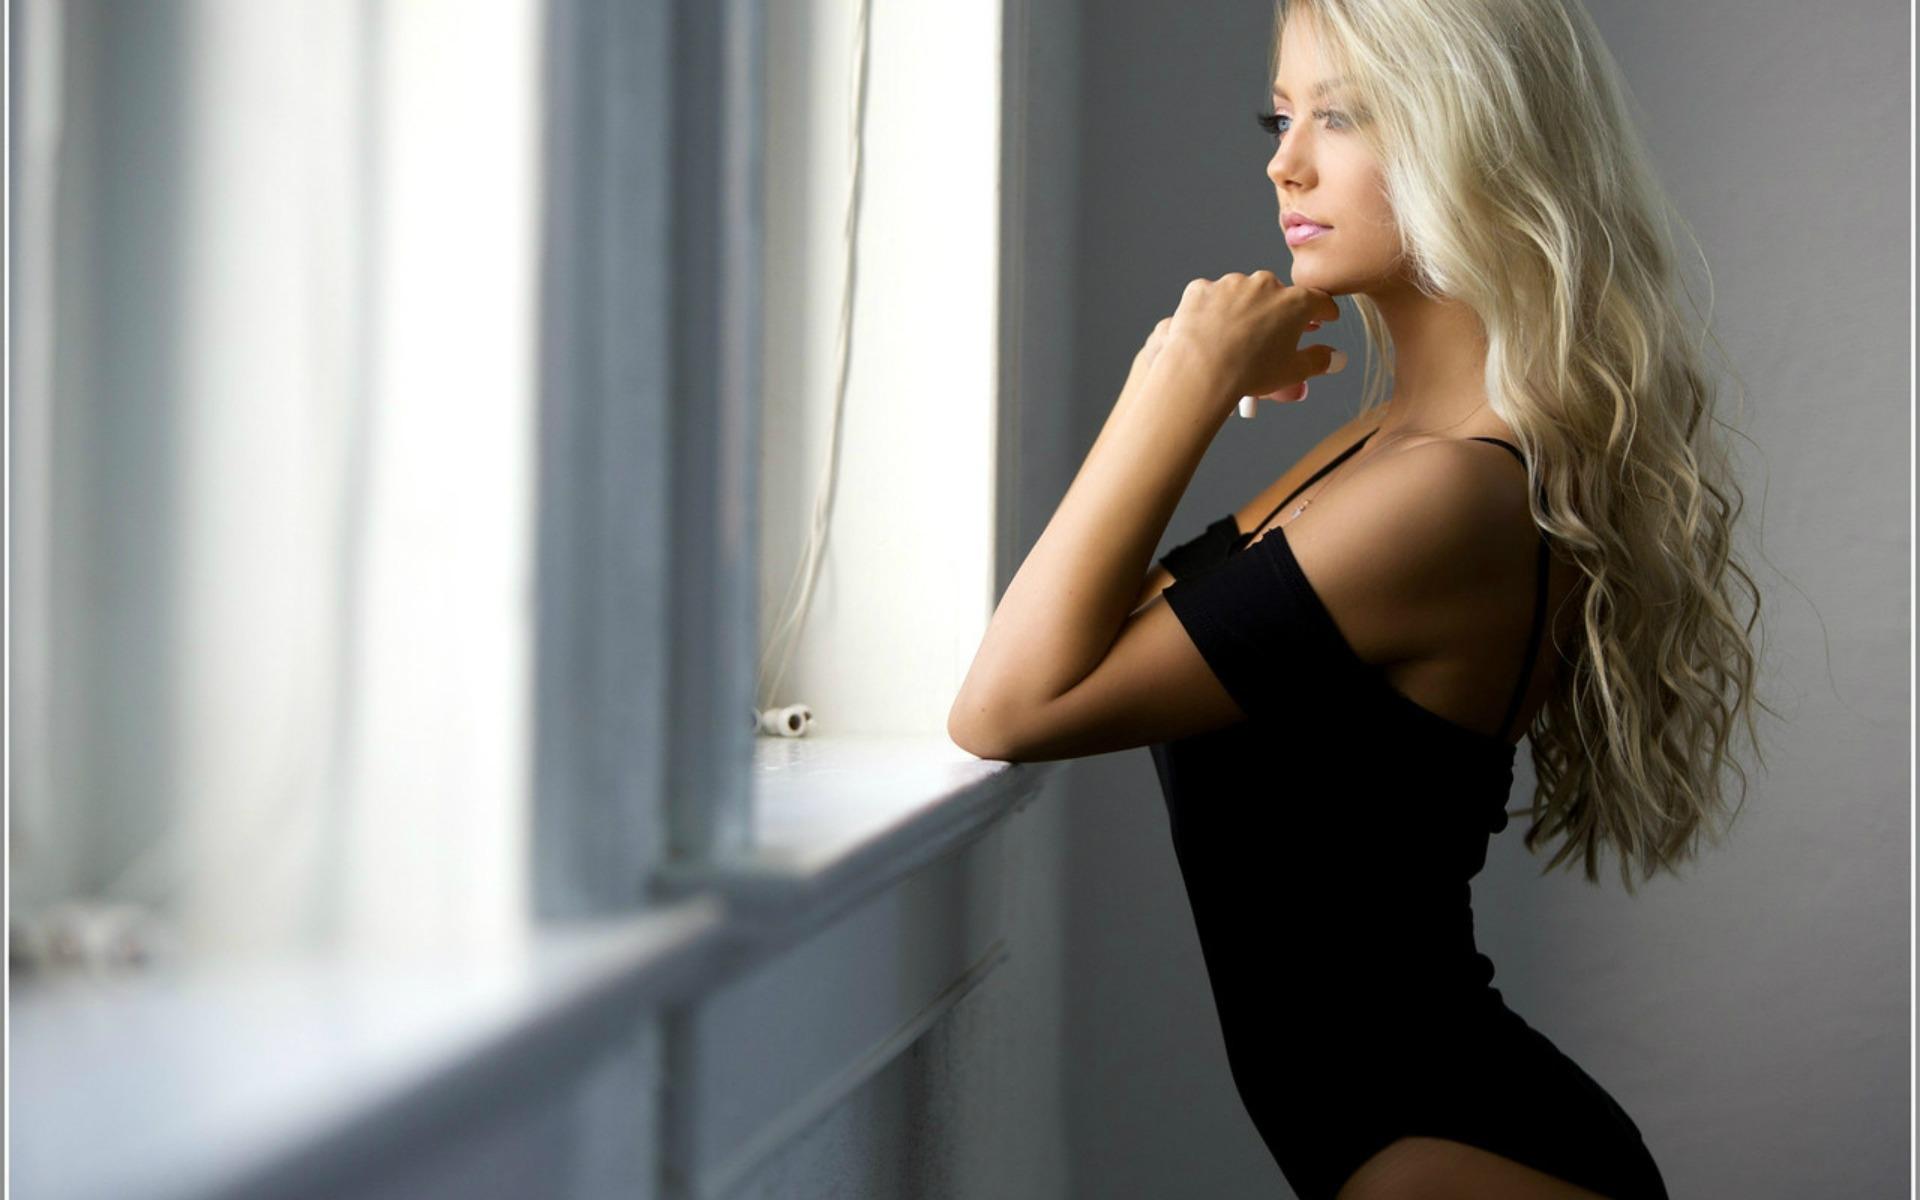 Картинка блондинка боком стоит